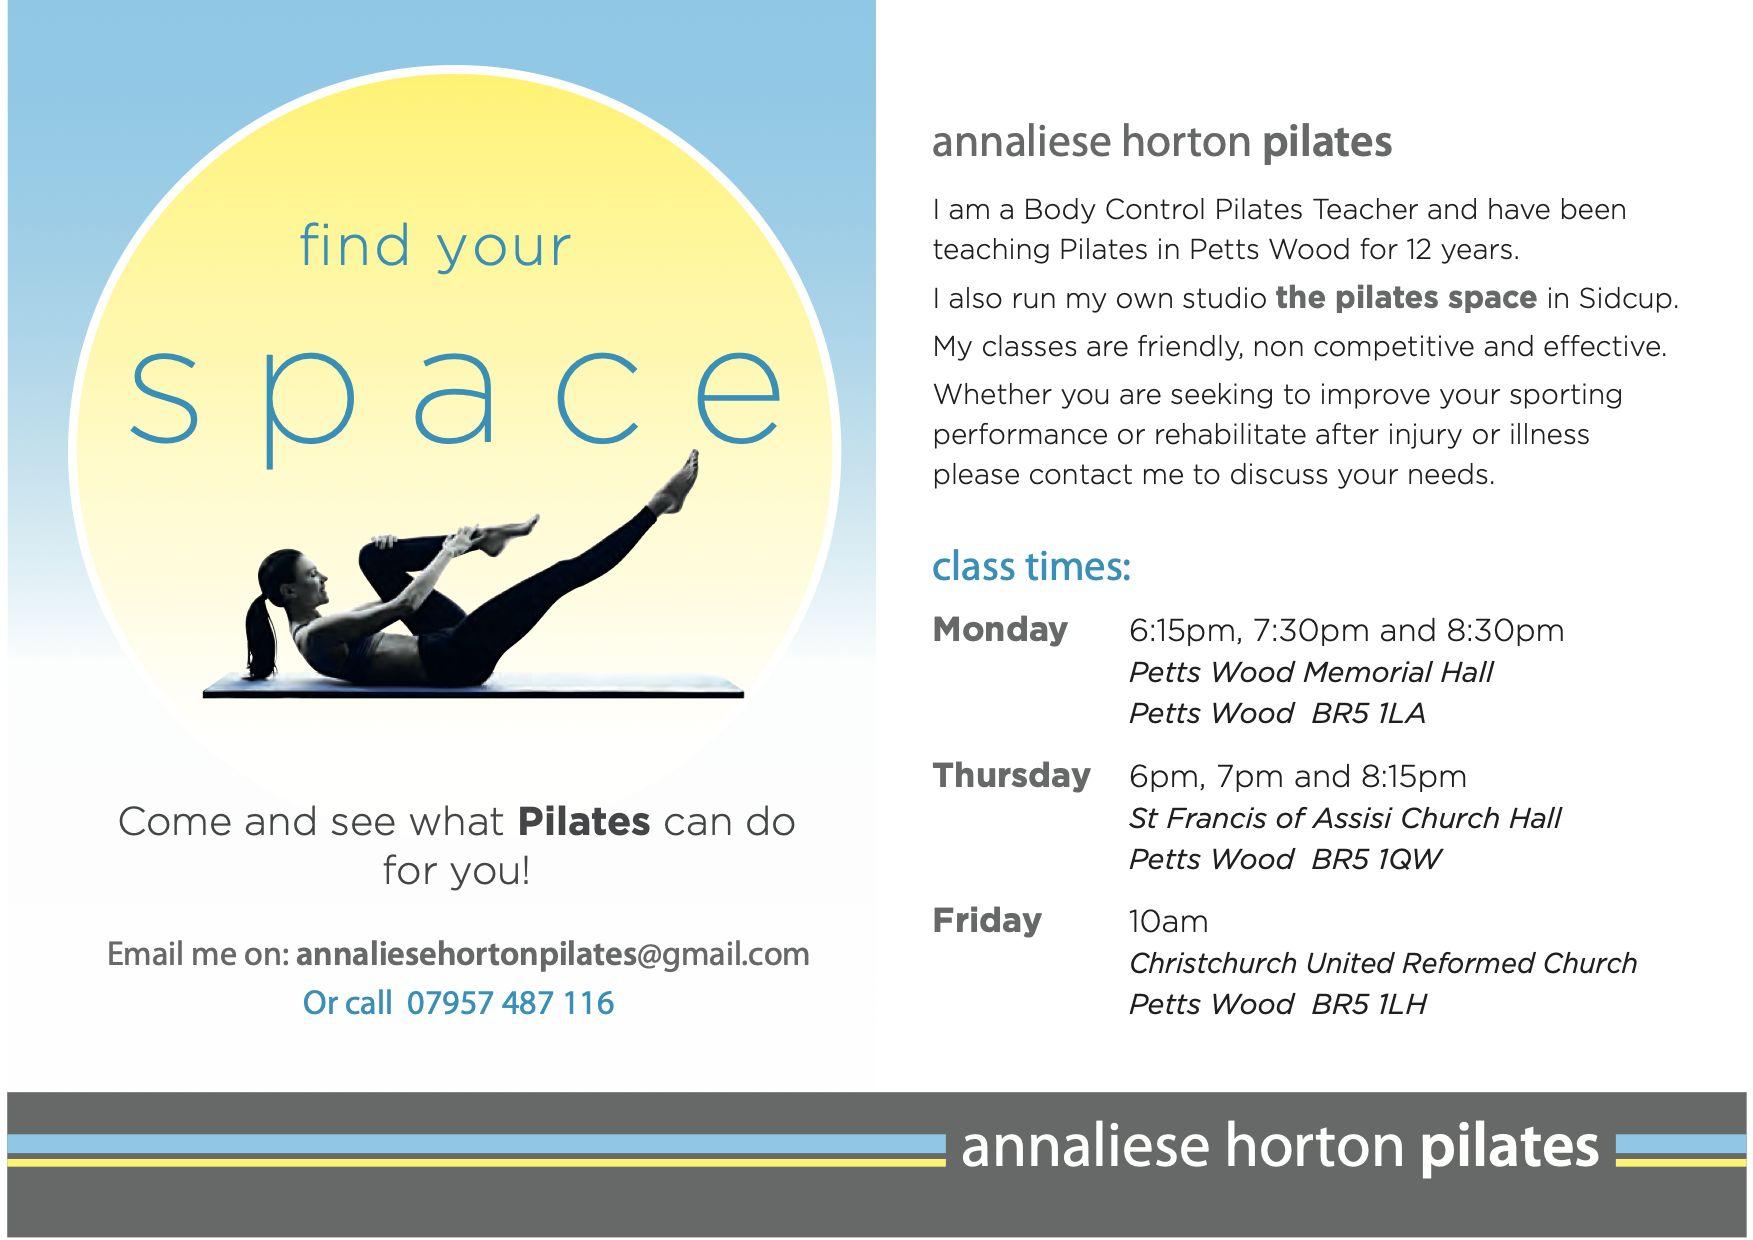 Annaliese Horton Pilates